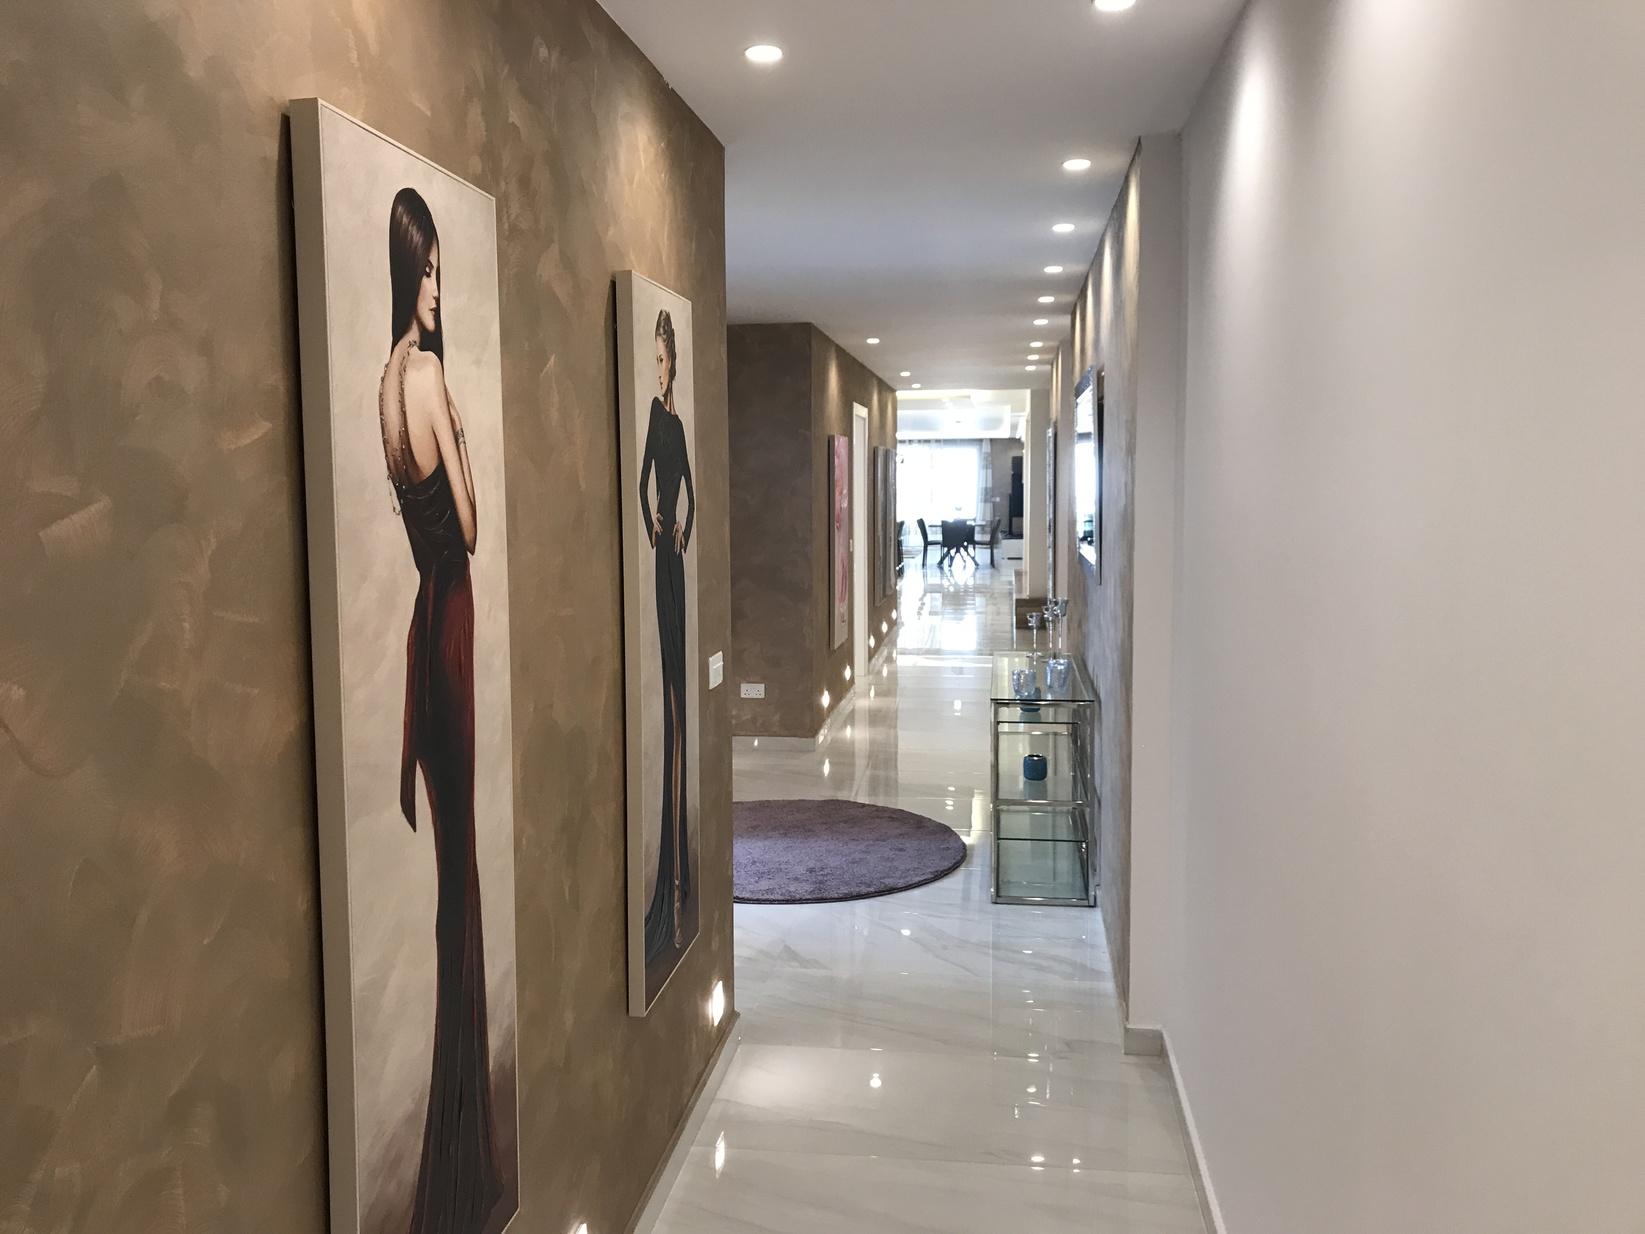 3 bed Apartment For Rent in Qawra, Qawra - thumb 19